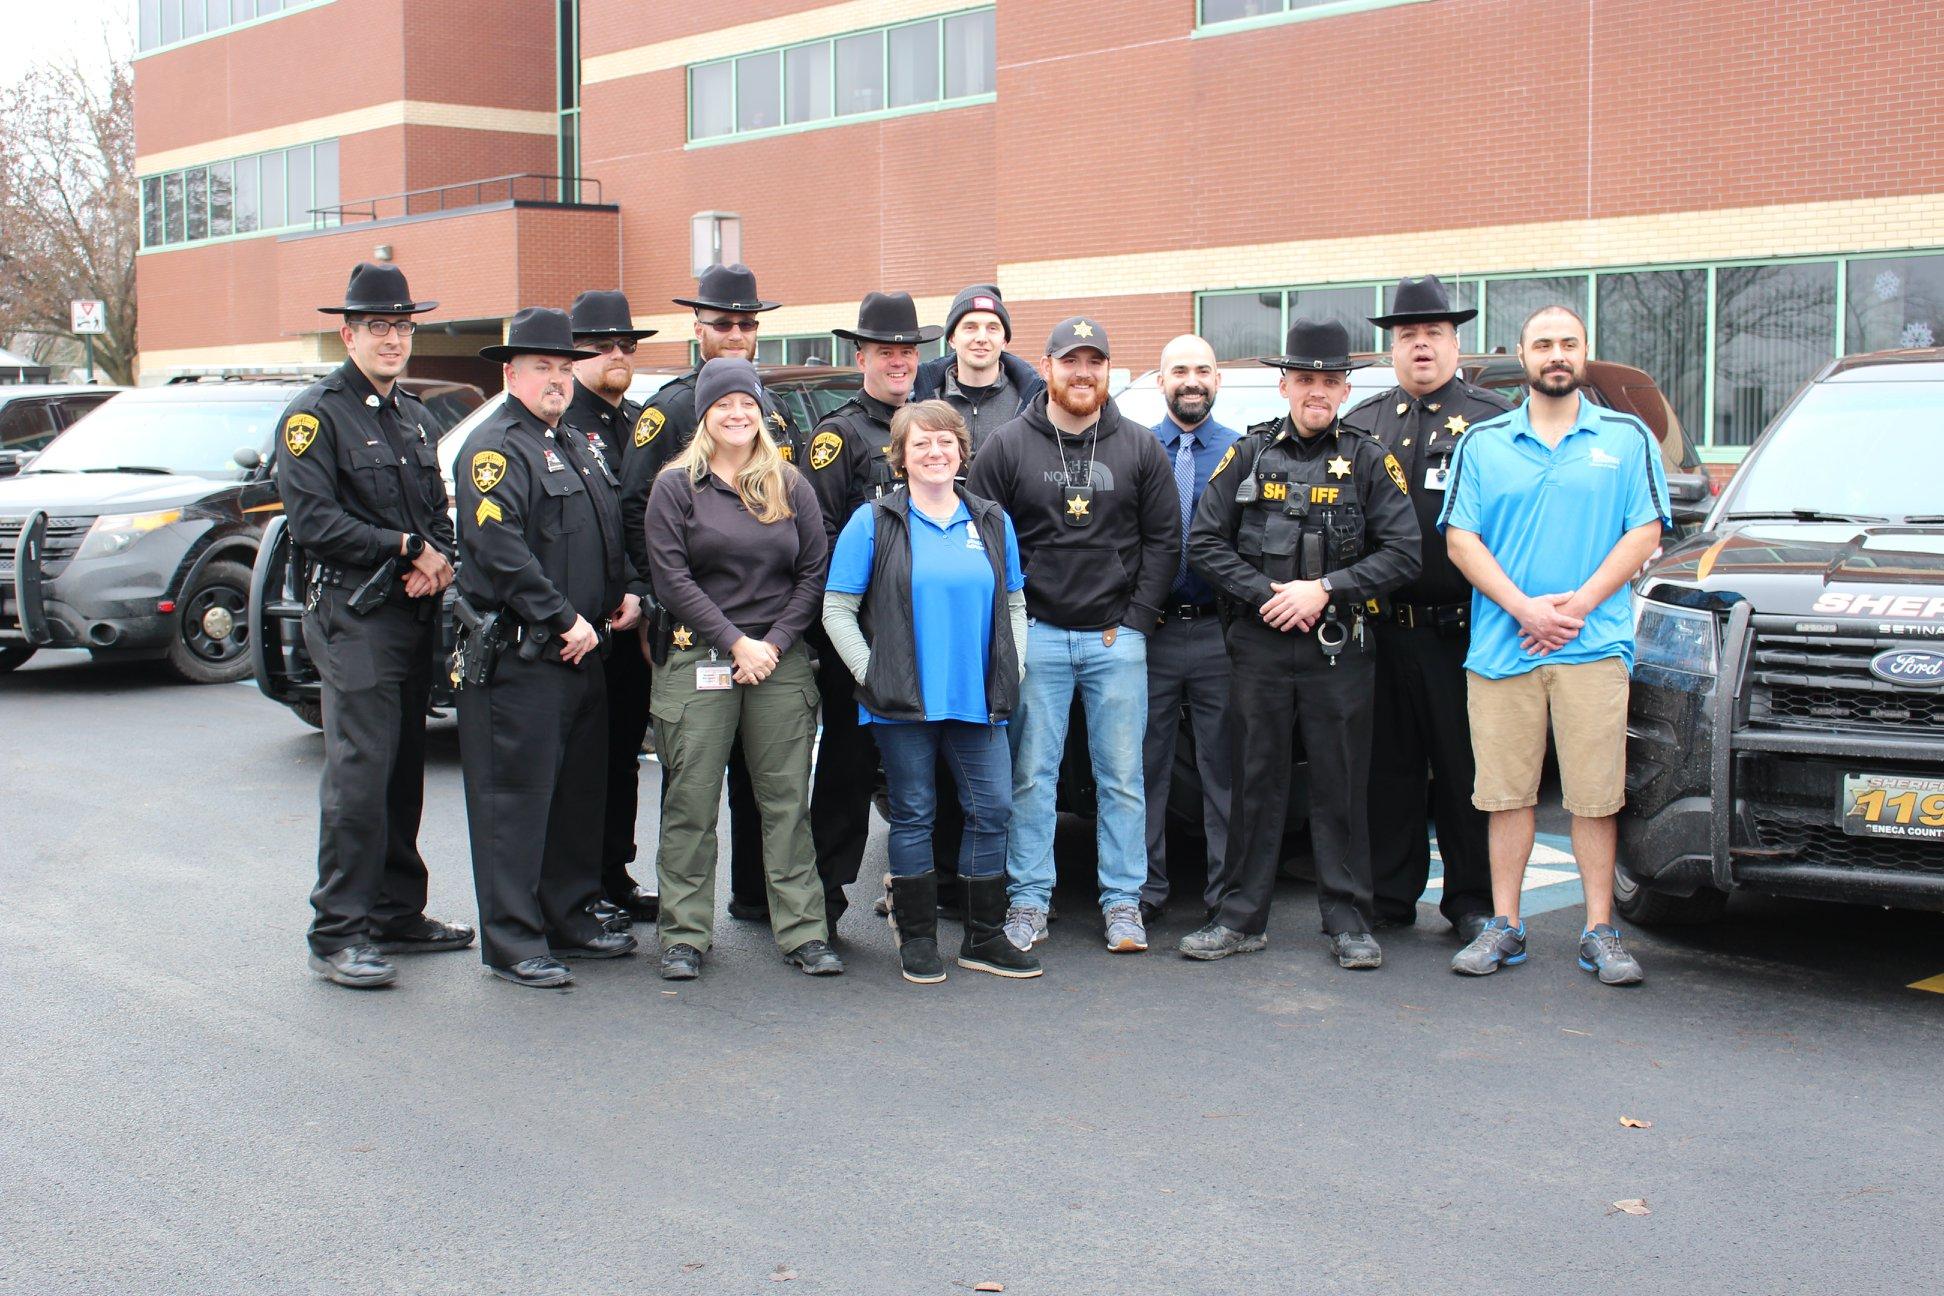 sececa county police